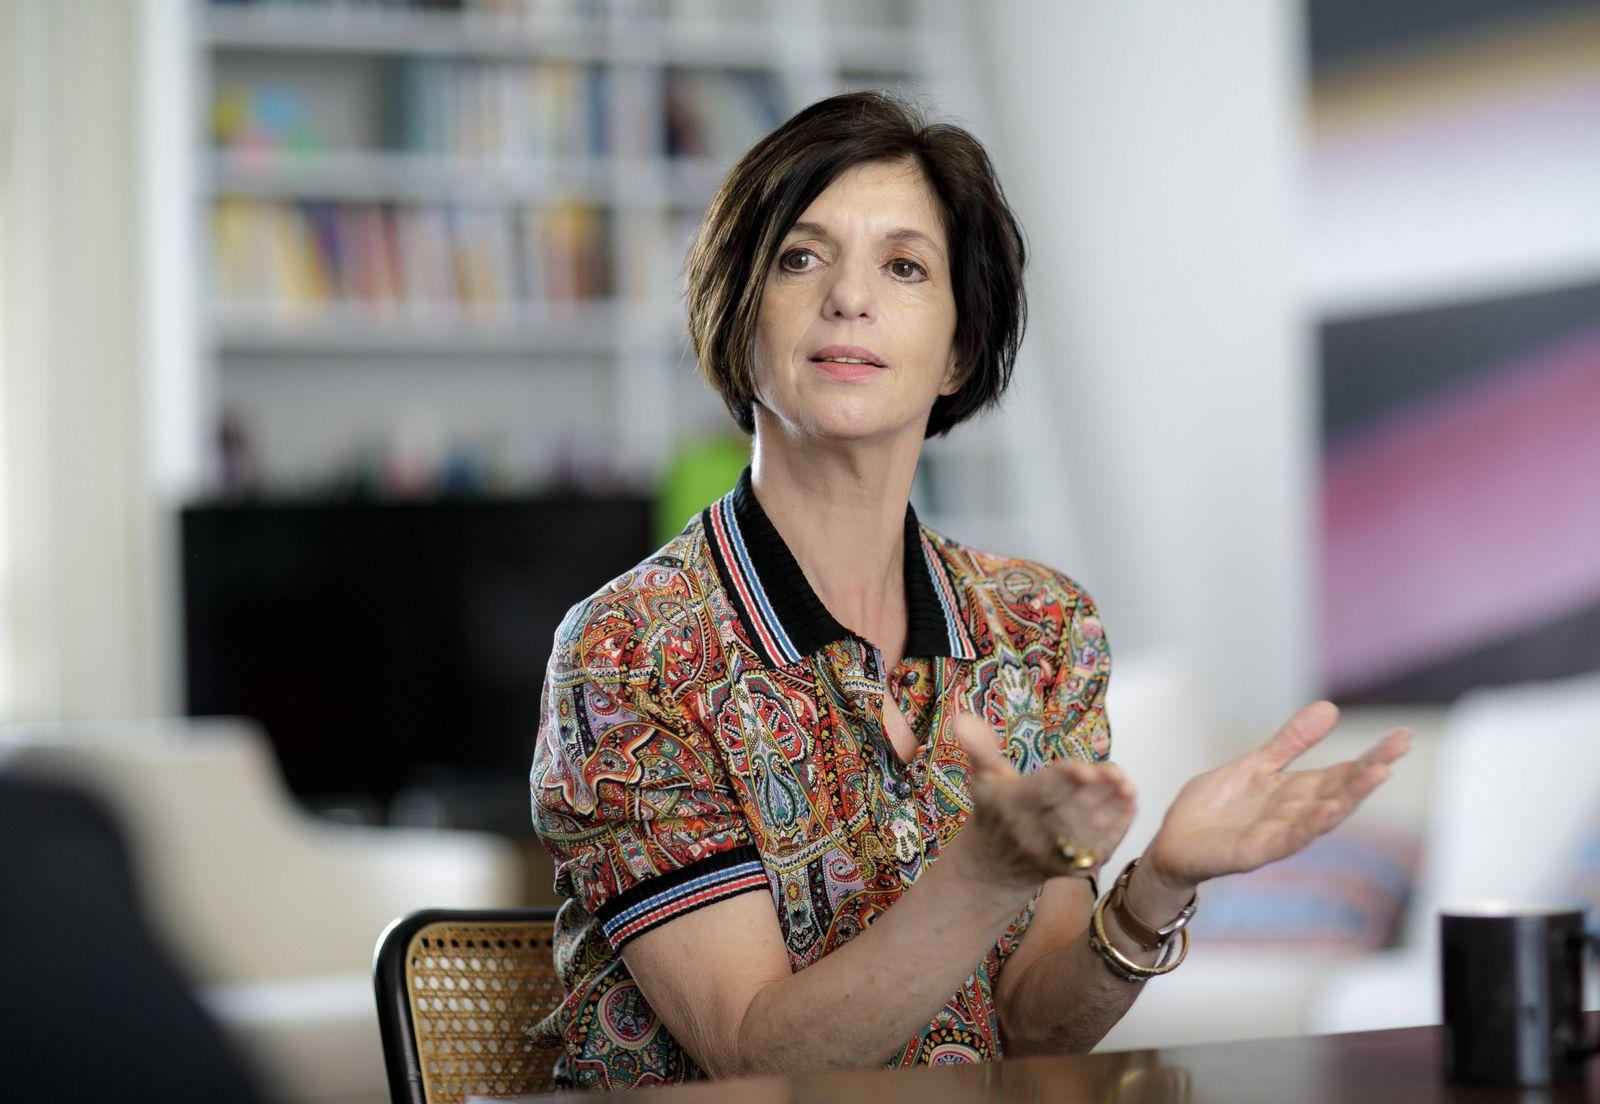 Prof Dr h c Jutta Allmendinger Praesidentin des Wissenschaftszentrums Berlin fuer Sozialforschun